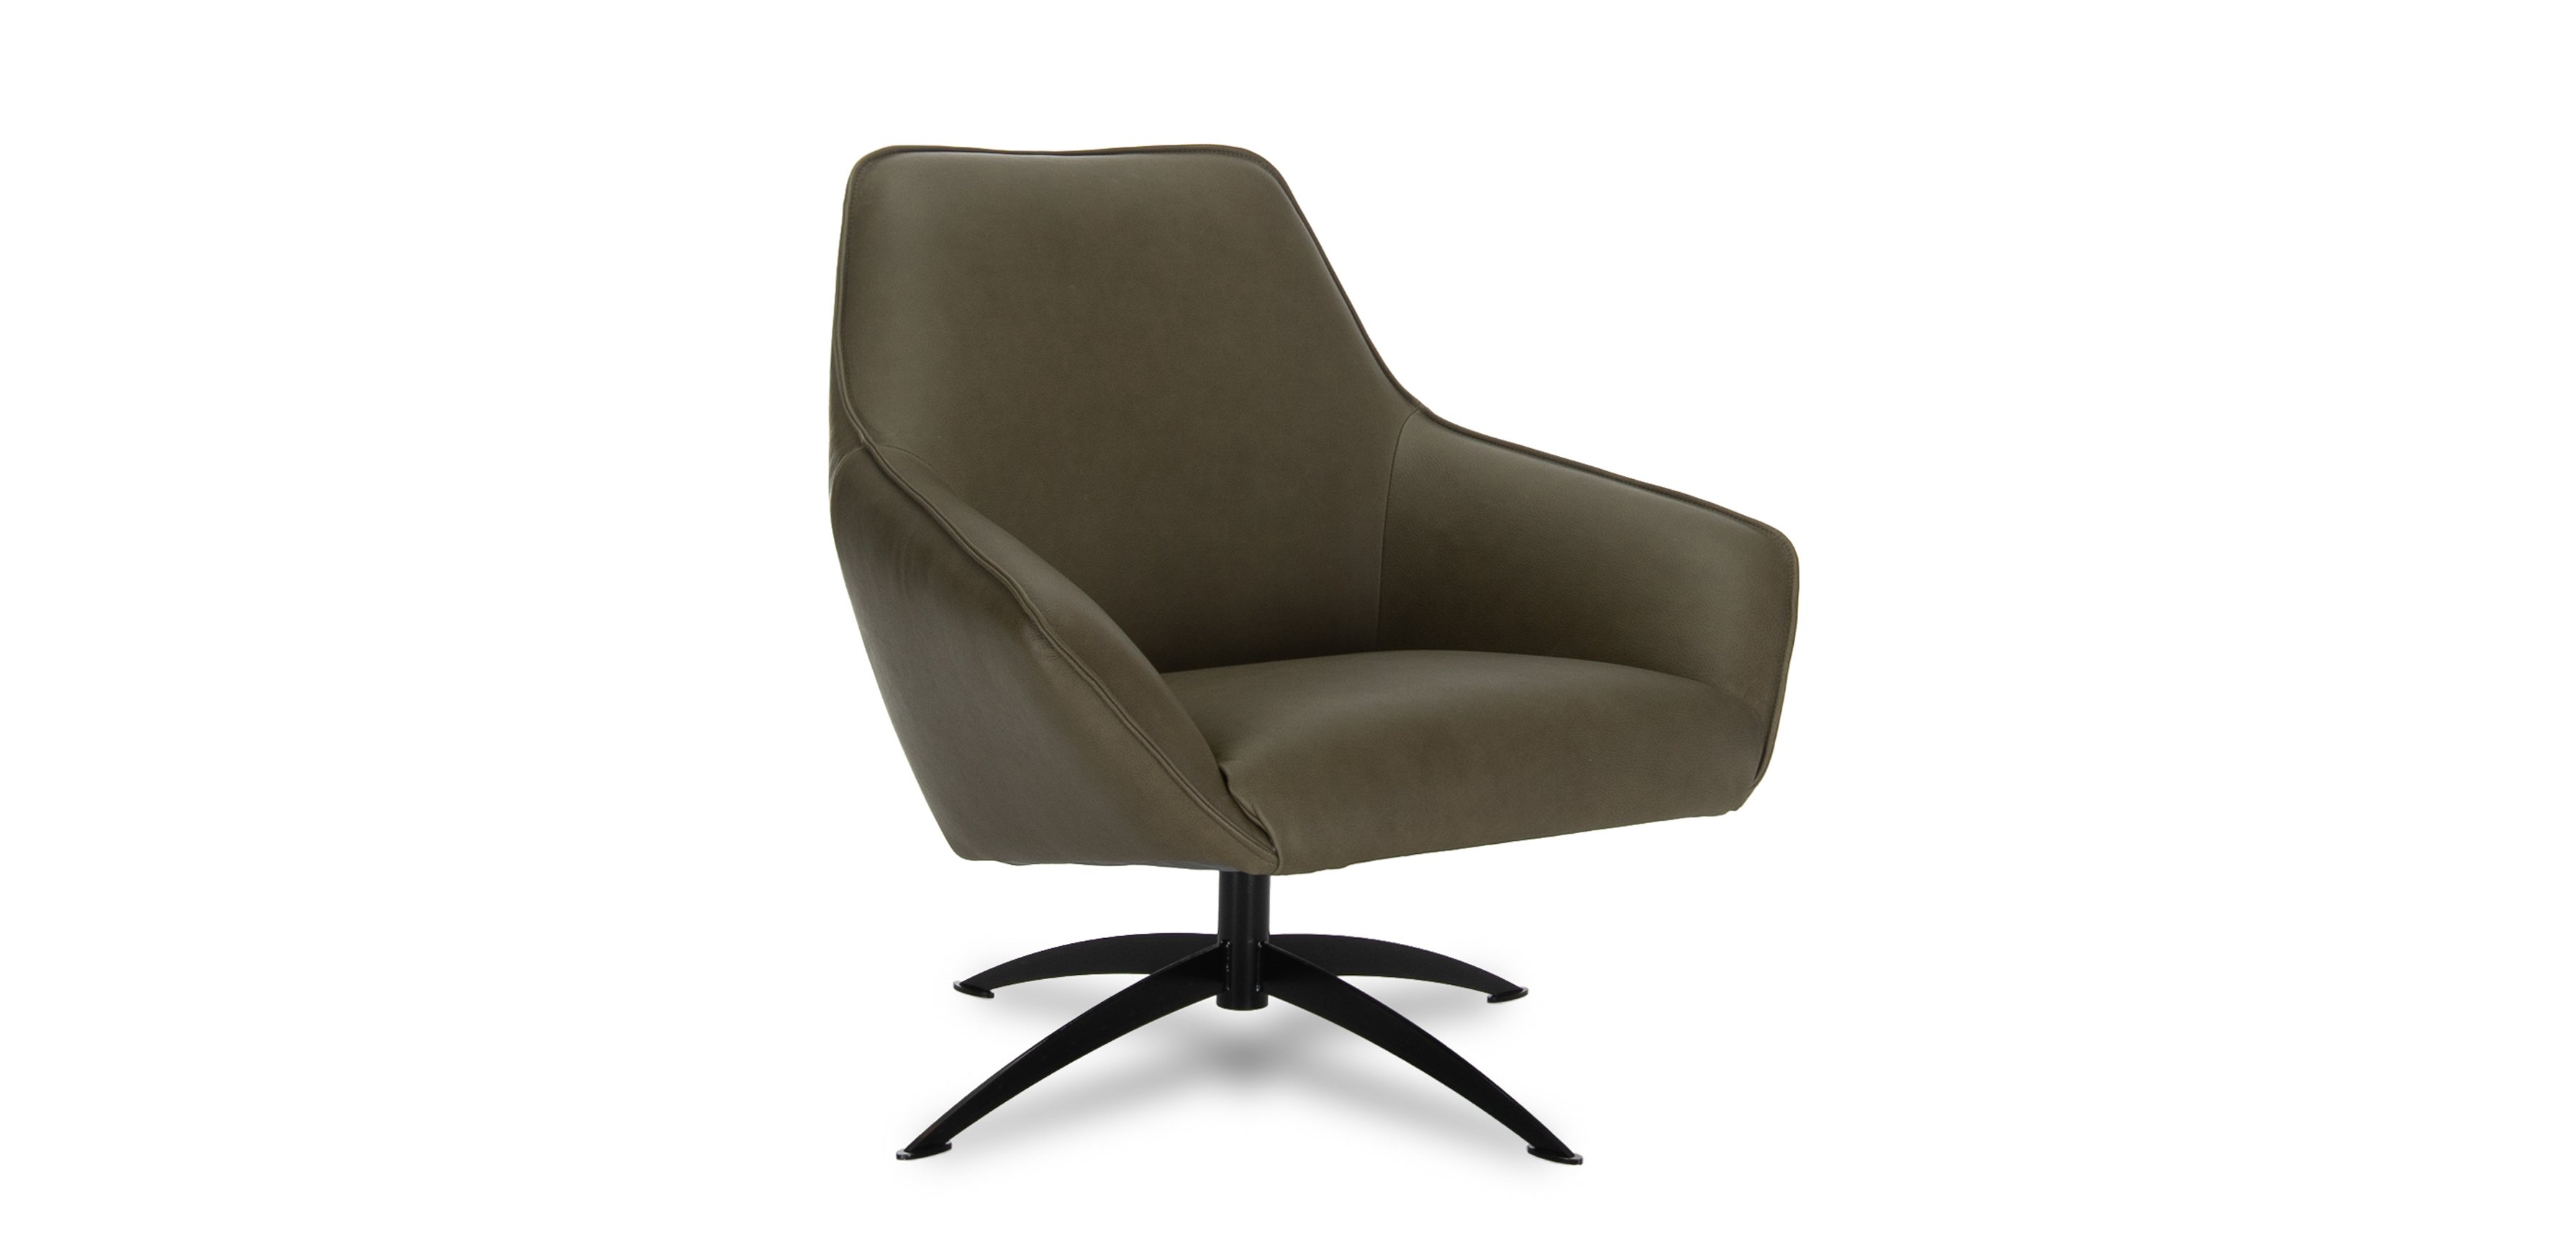 Faas fauteuil DYYK 3580x1750 leer 3